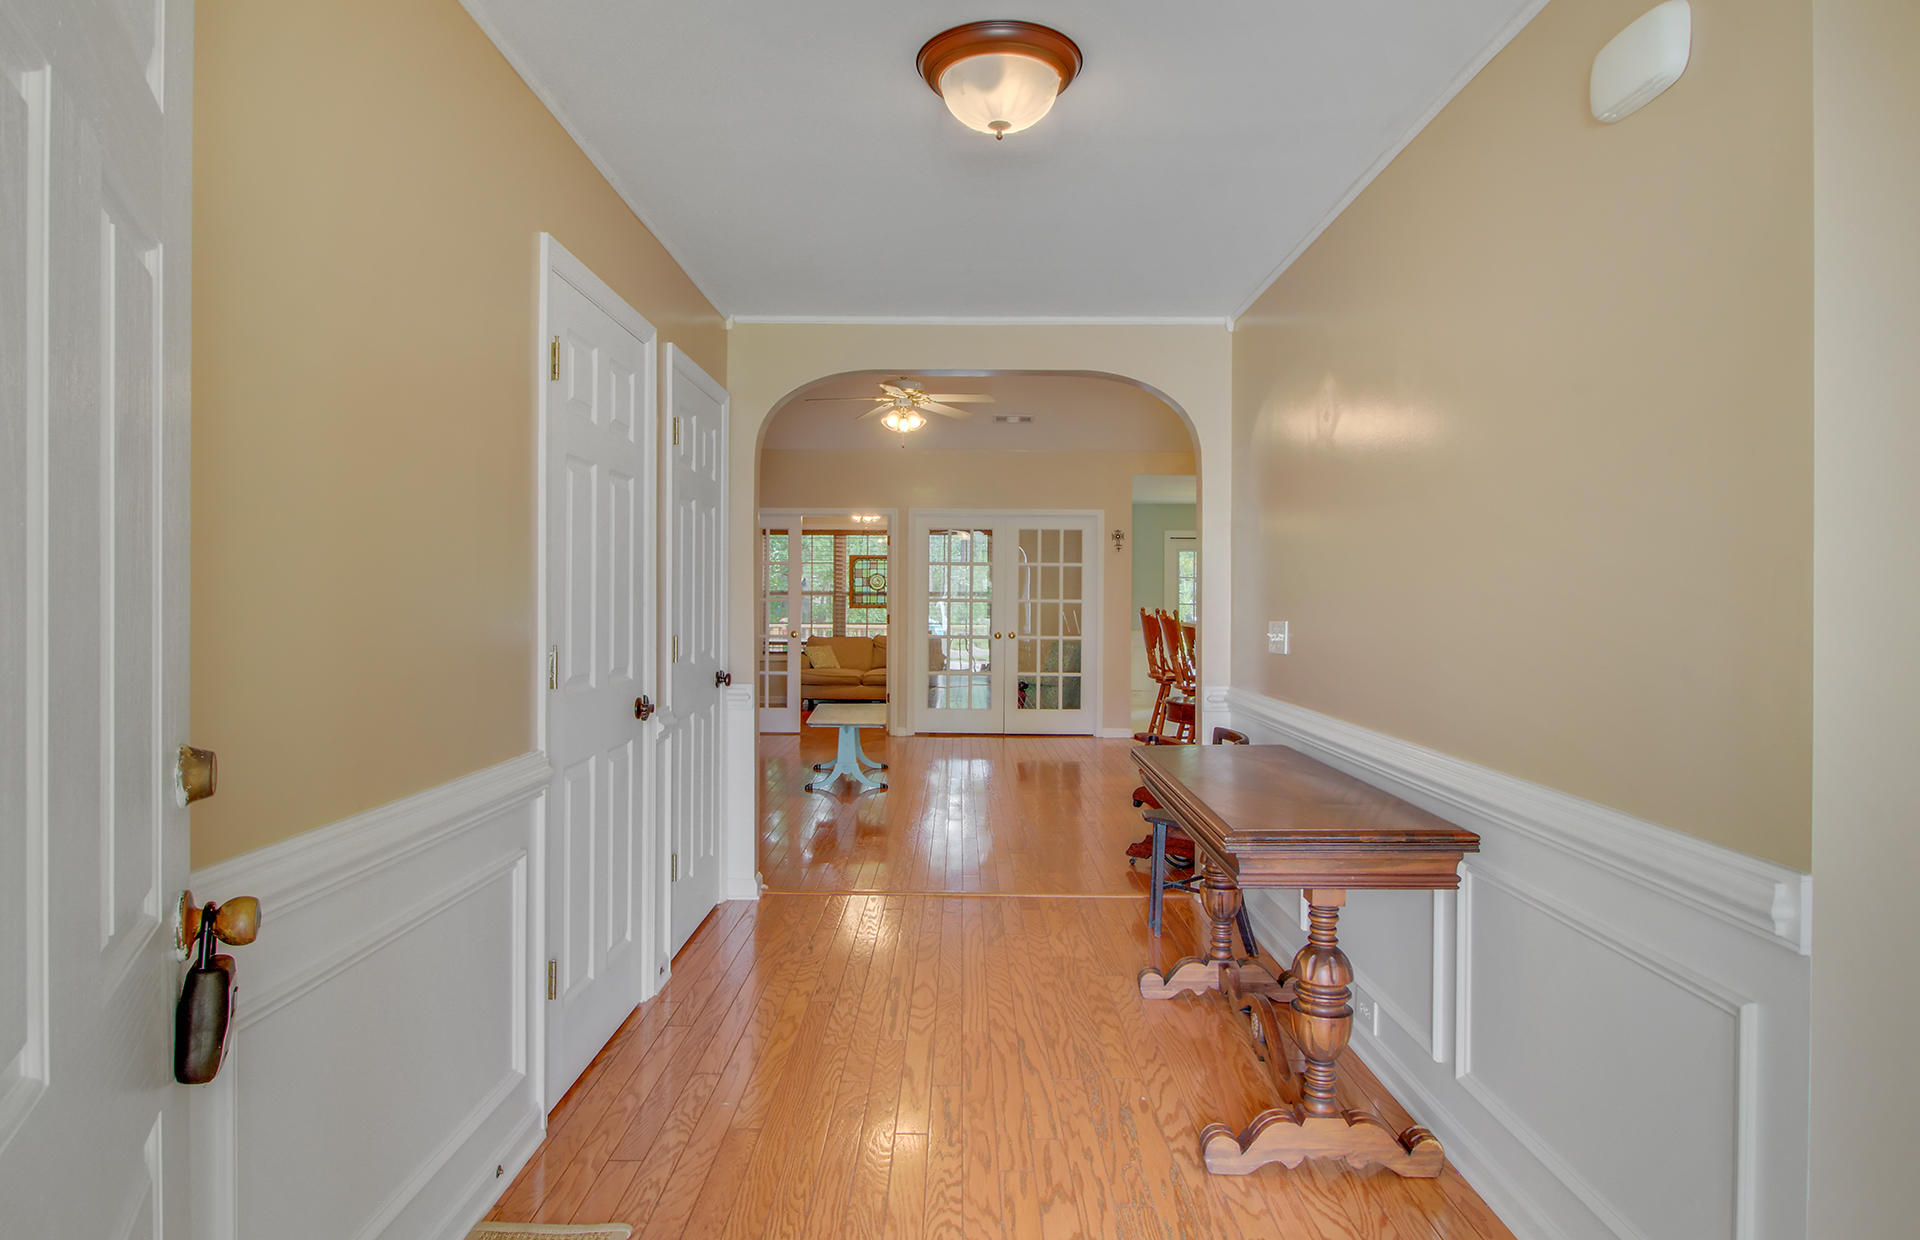 Park West Homes For Sale - 1500 Wellesley, Mount Pleasant, SC - 21